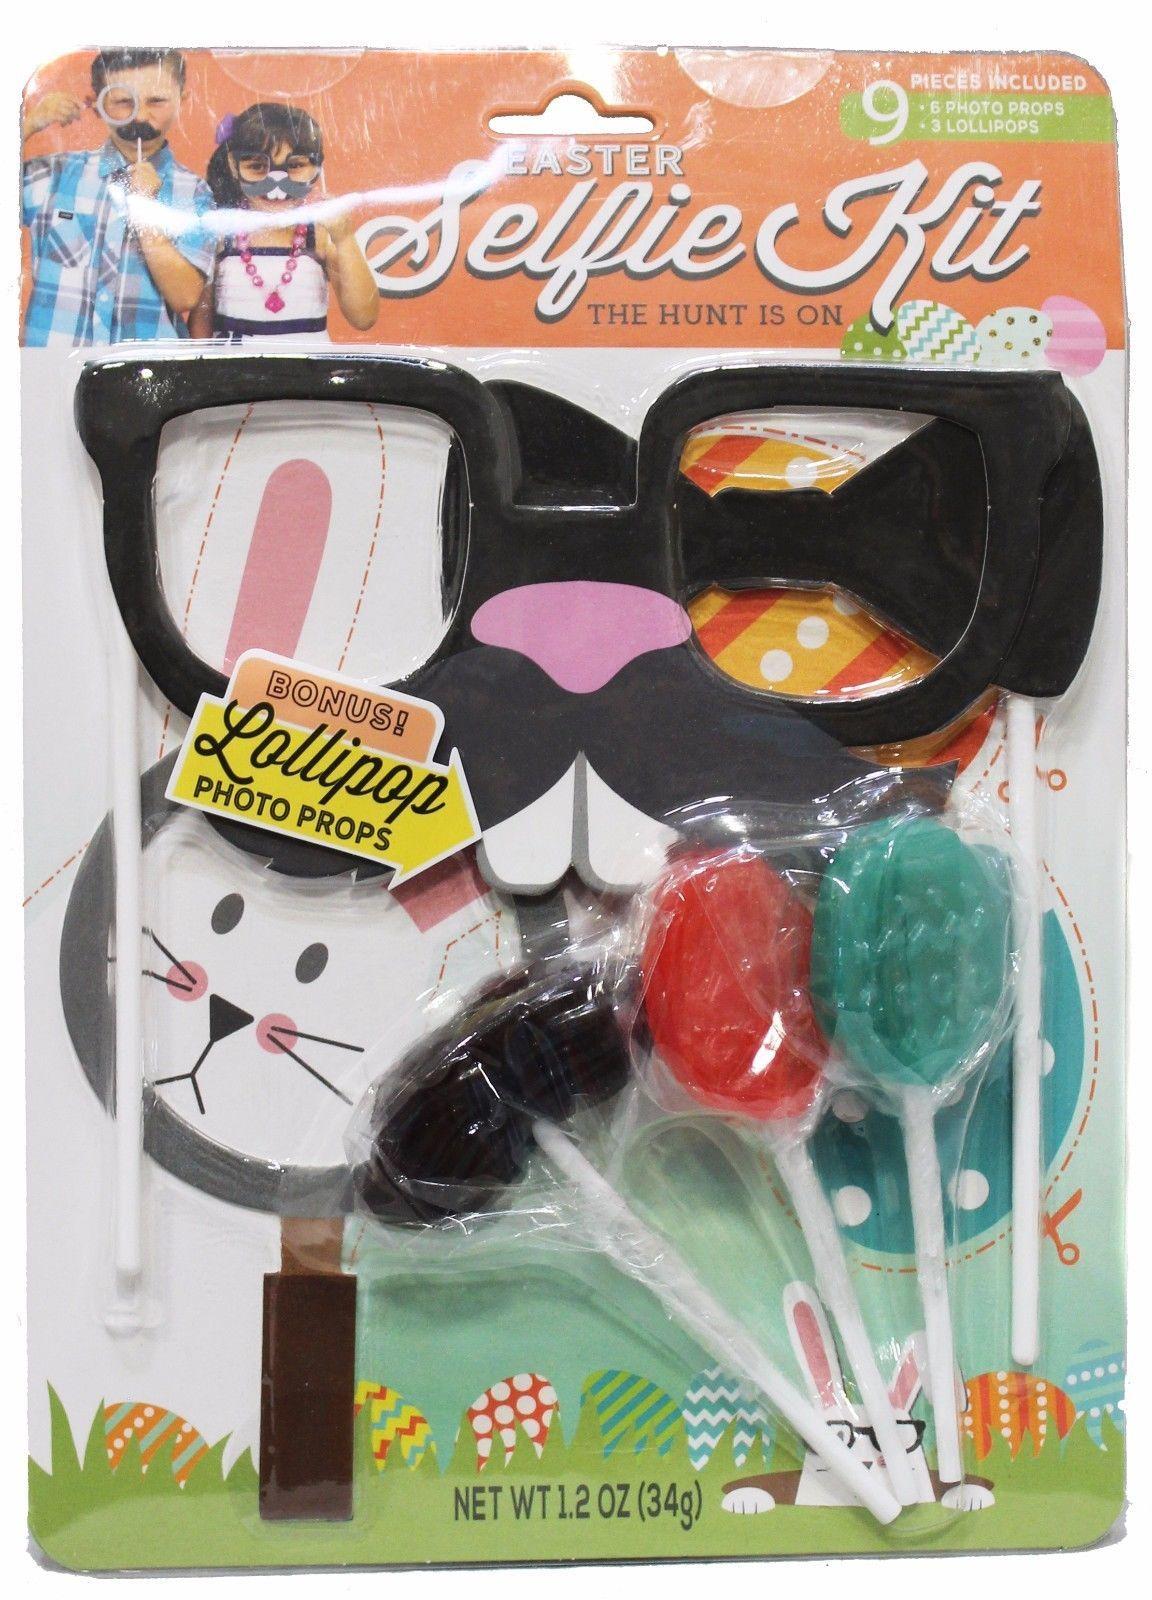 MODERN GOURMET* 9pc Set SELFIE KIT Photo Props+Lollipops EASTER New *YOU CHOOSE*